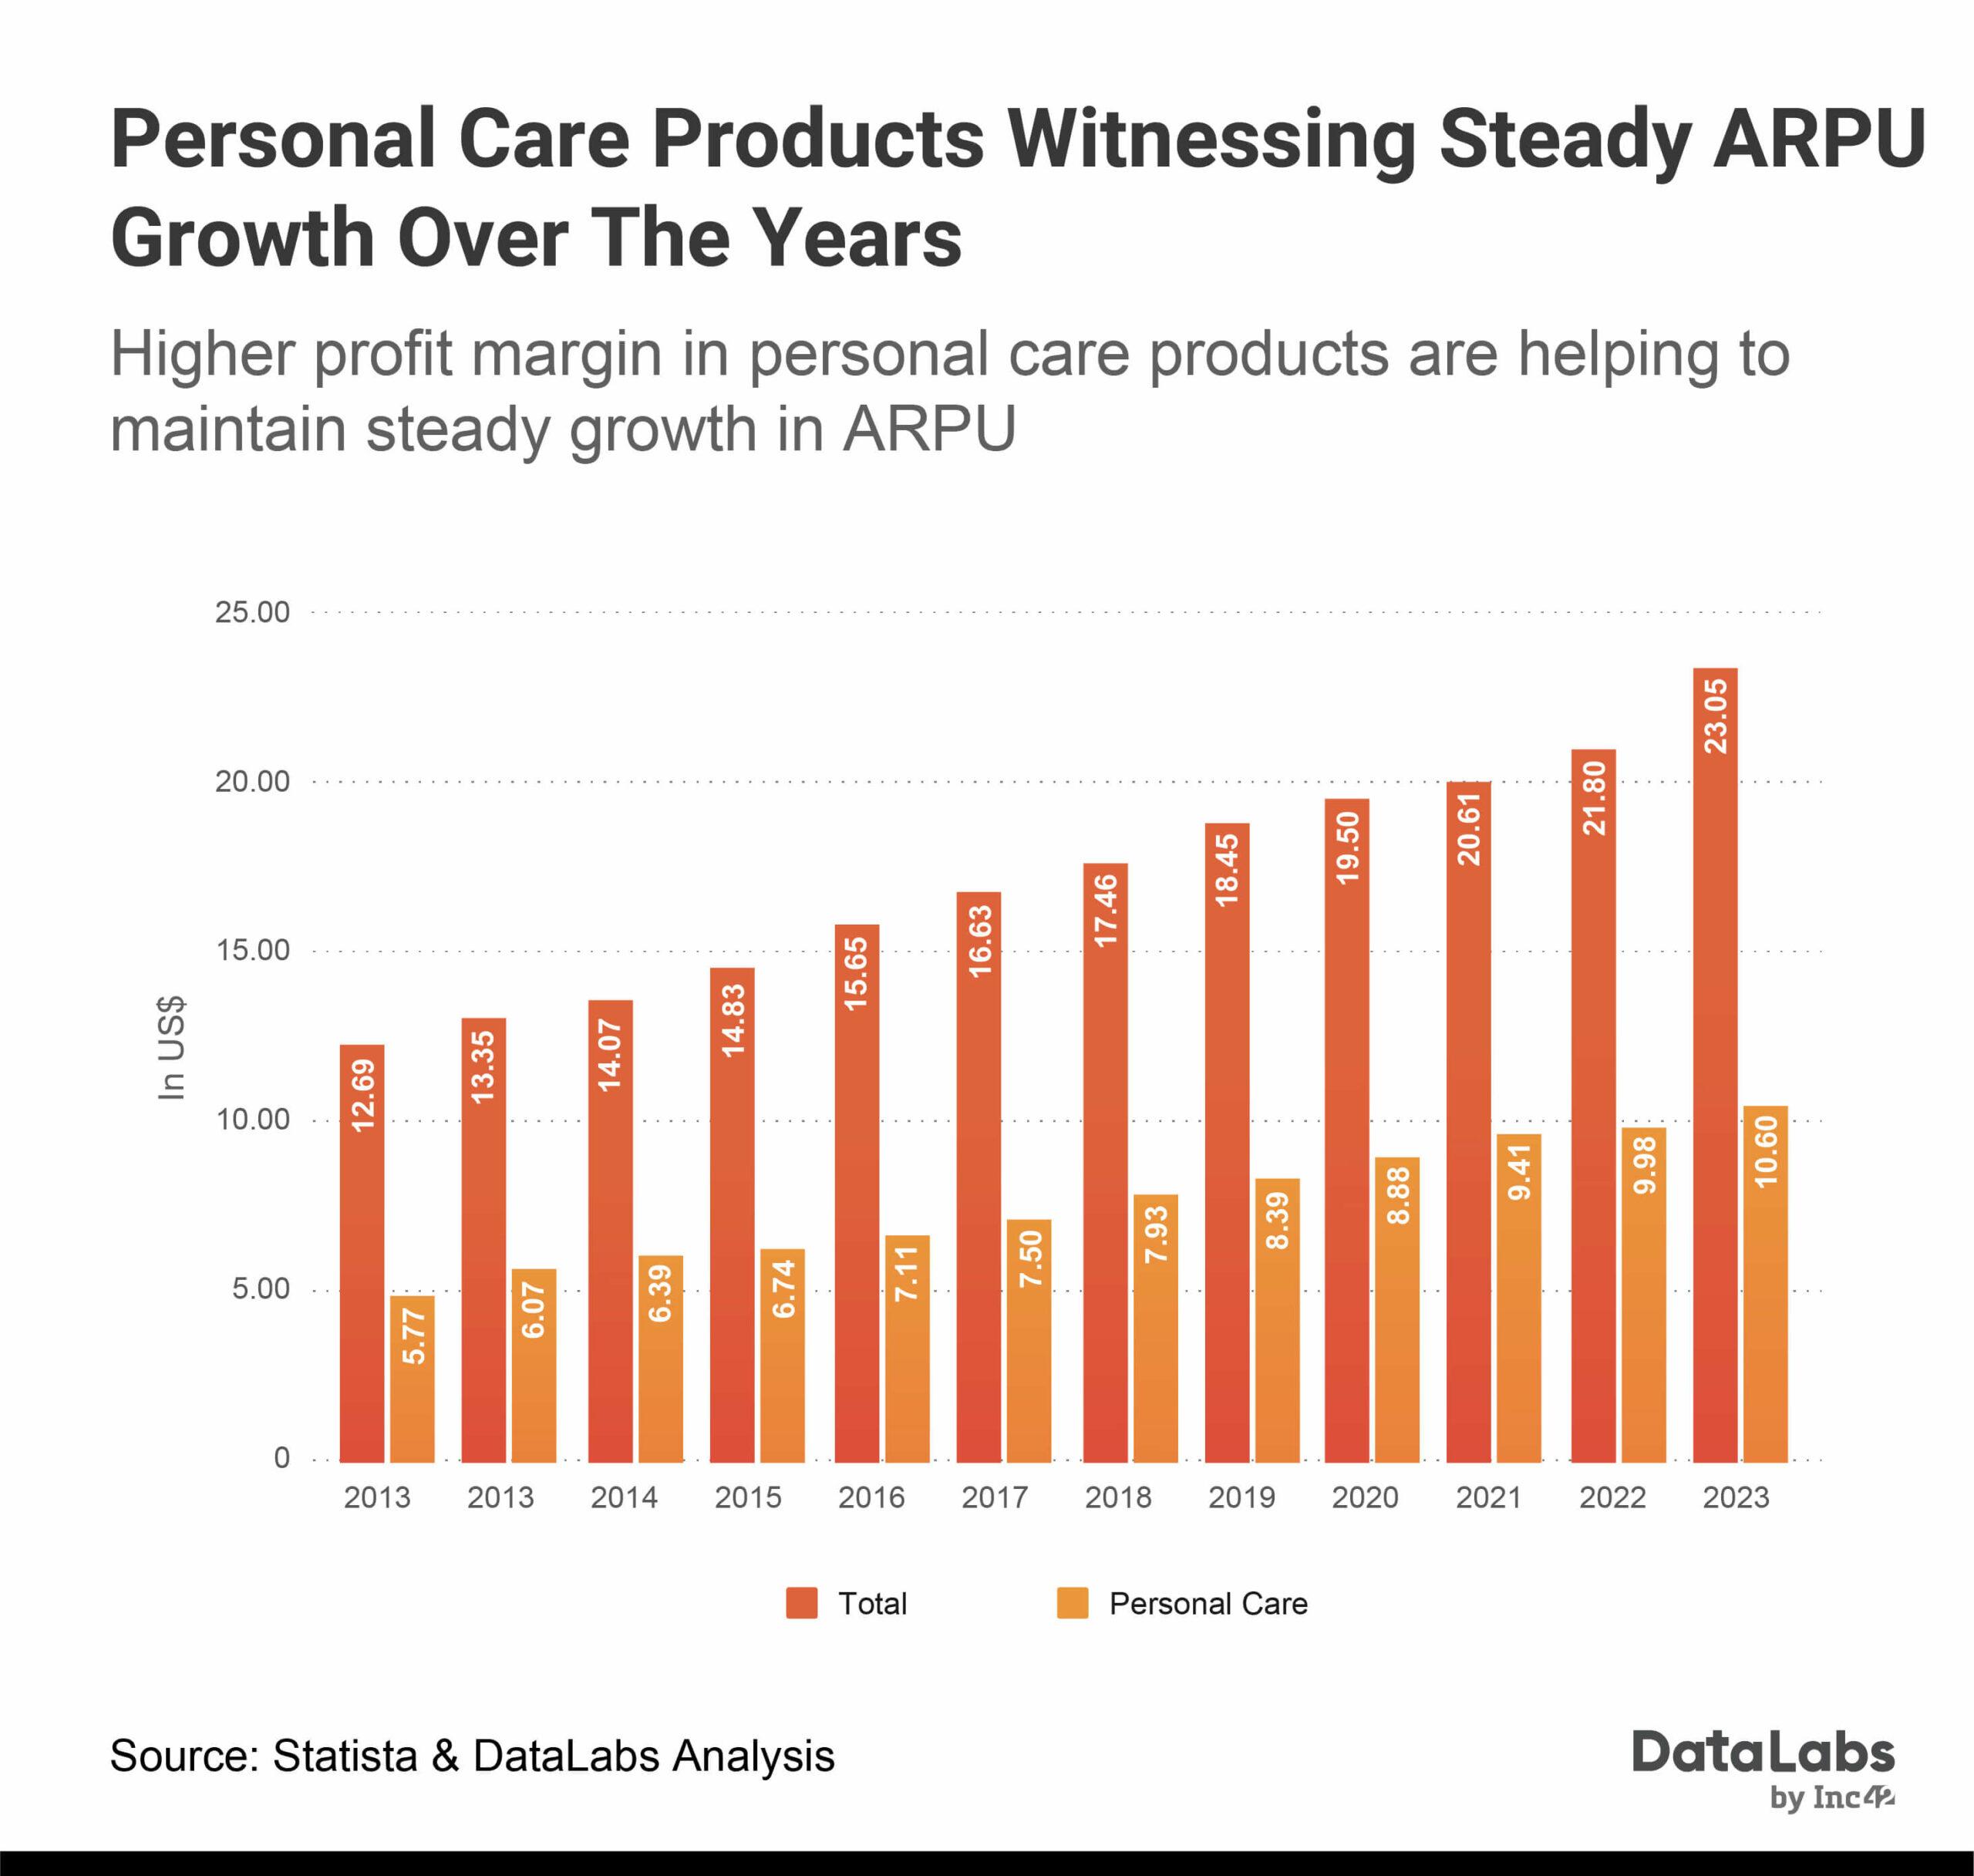 Personal Hygiene Revenue